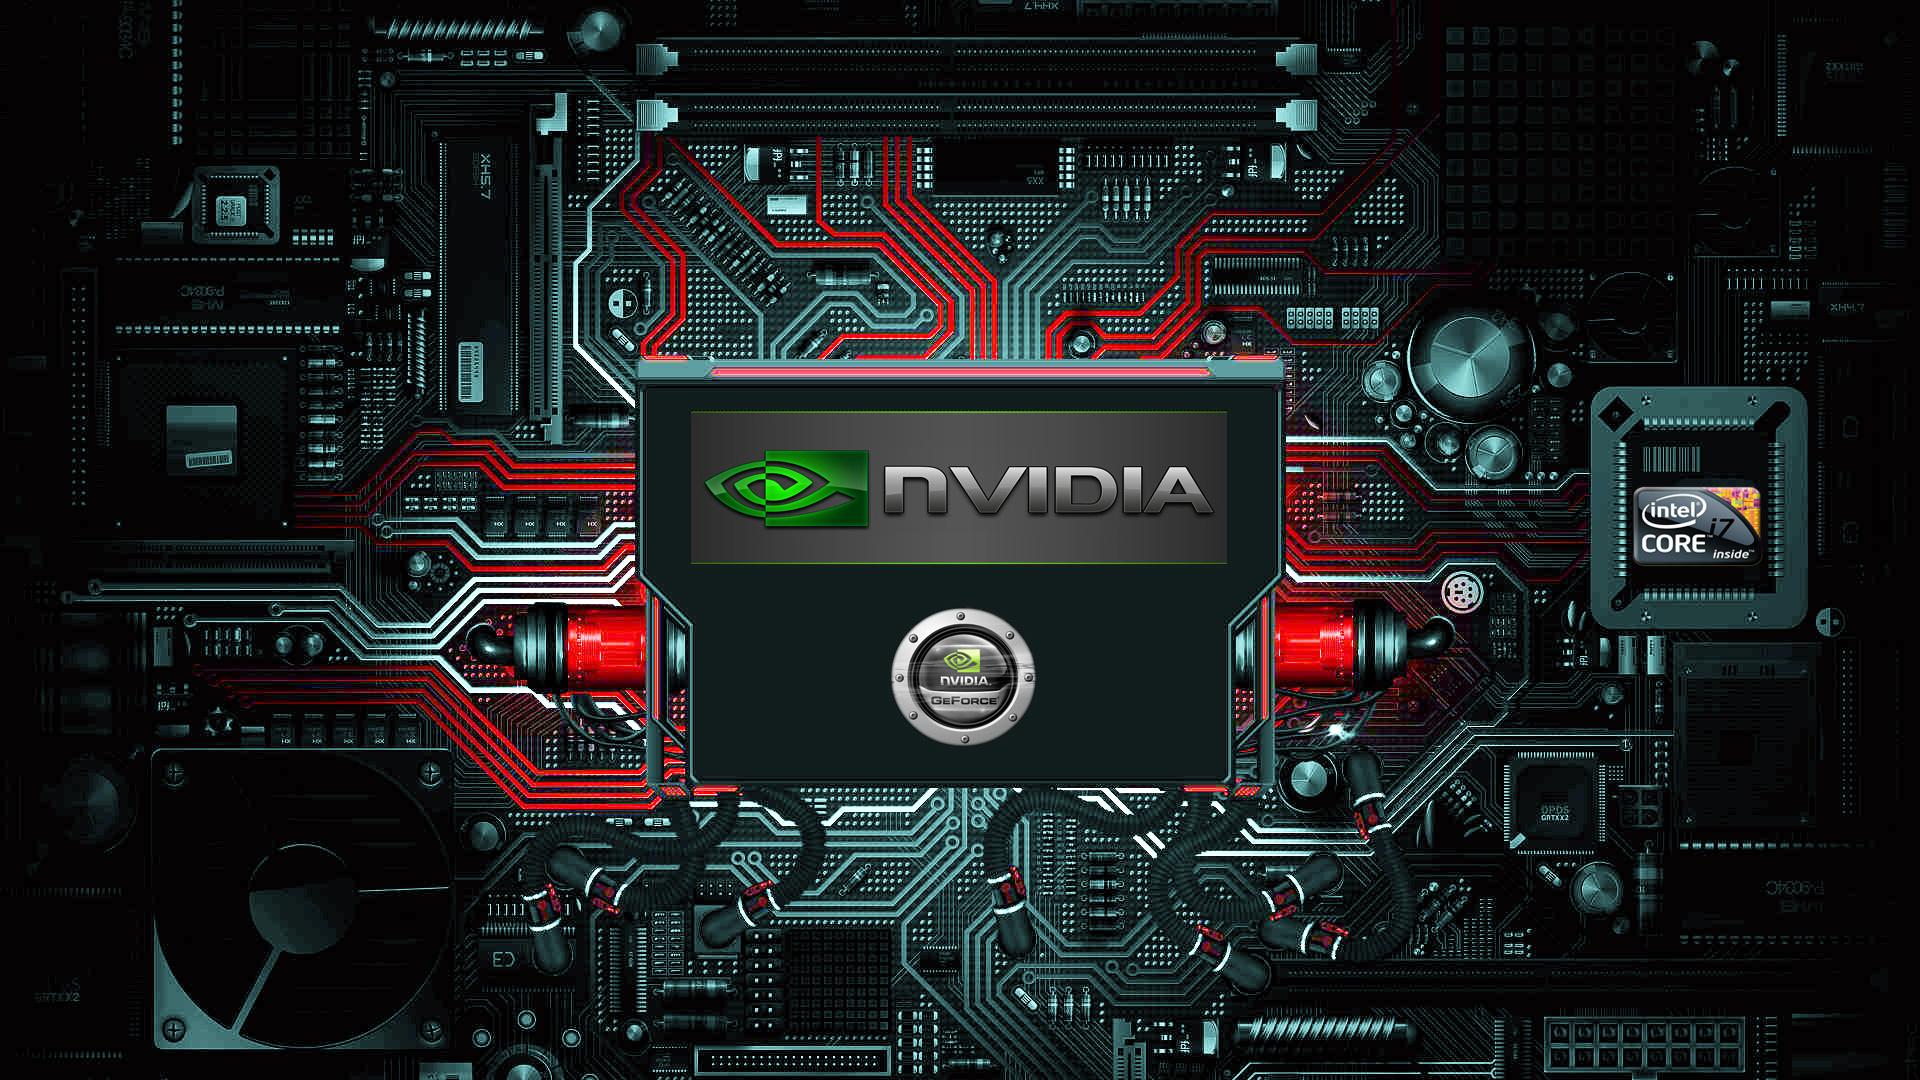 nvidia intel gigabyte wallpaper - photo #39